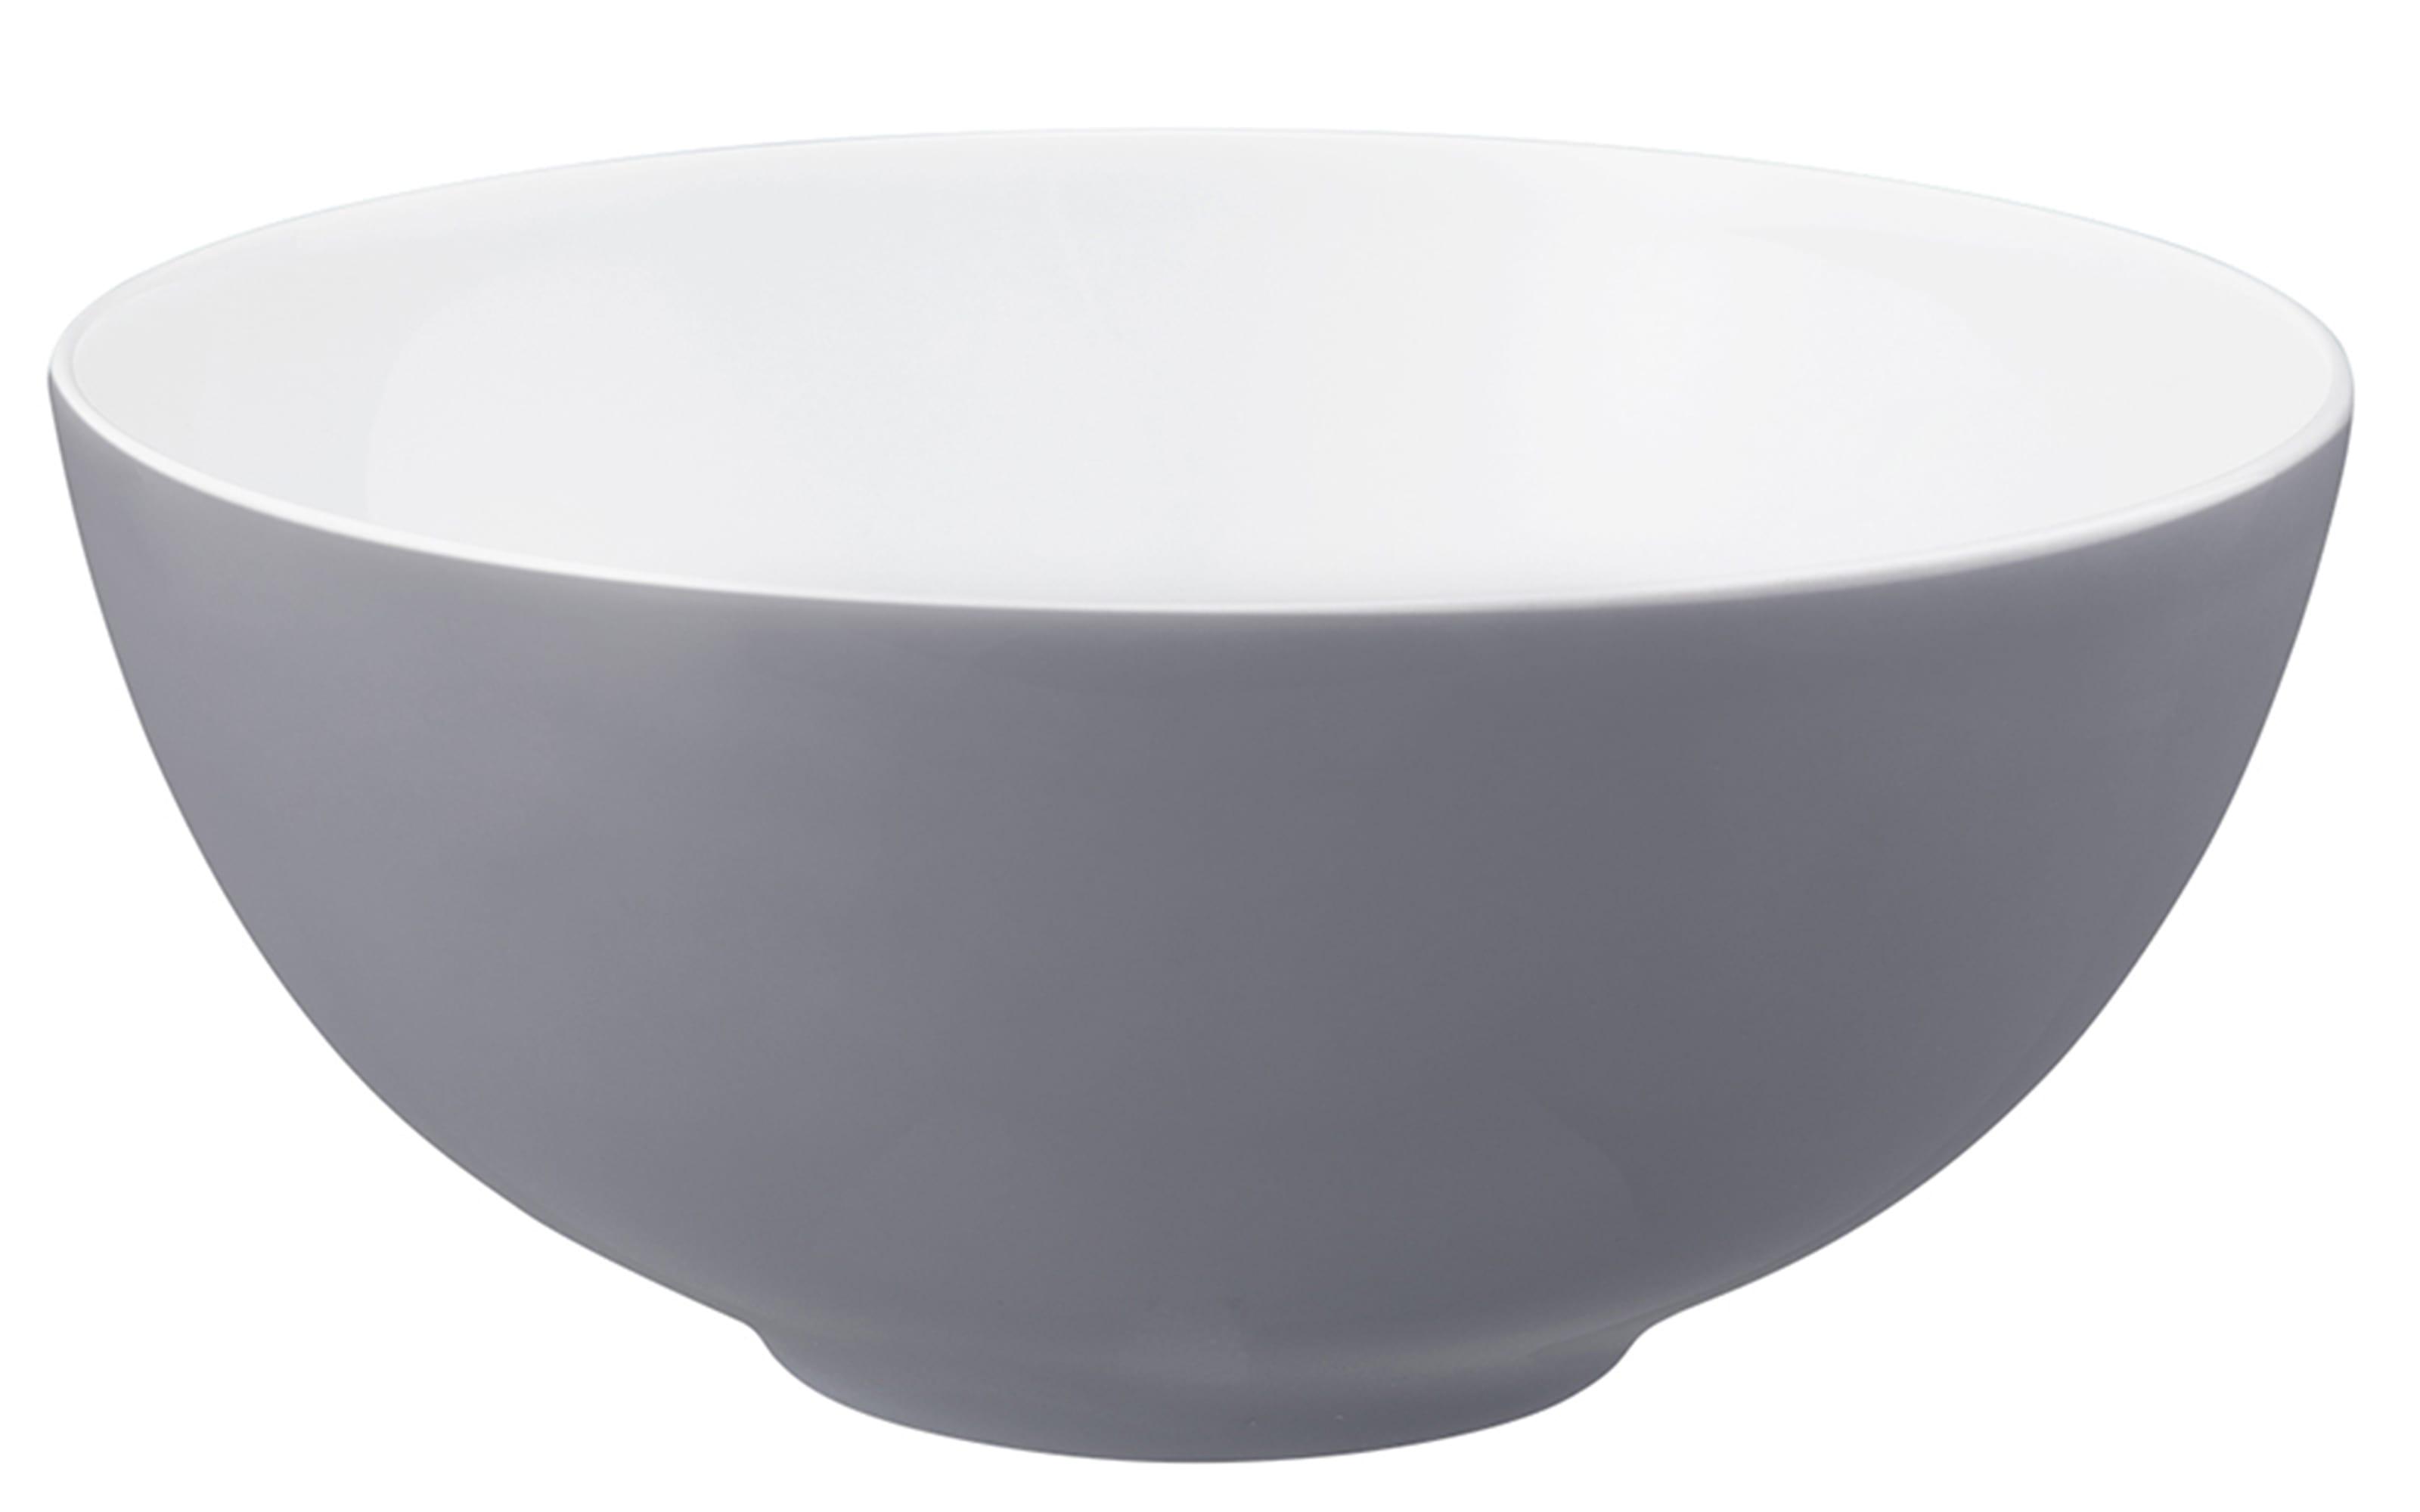 Schüssel Life Elegant Grey, 21 cm